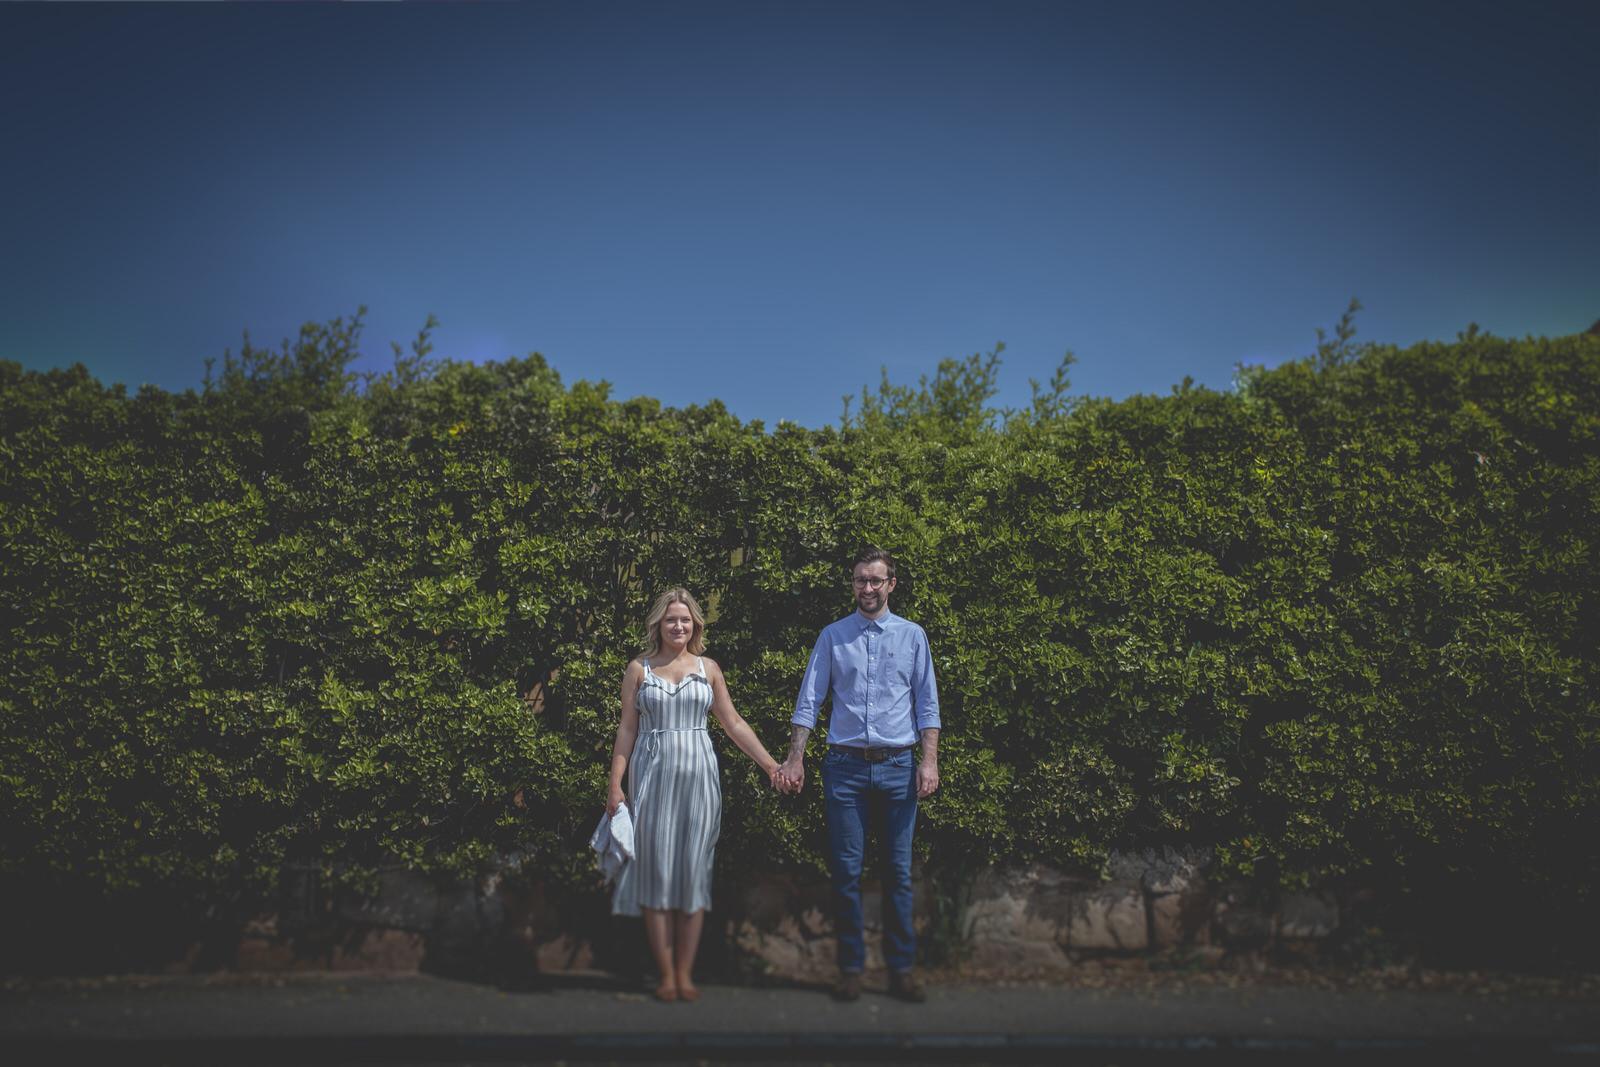 Felixstowe Beachfront Engagement - Sinead  Ryan - 001.jpg